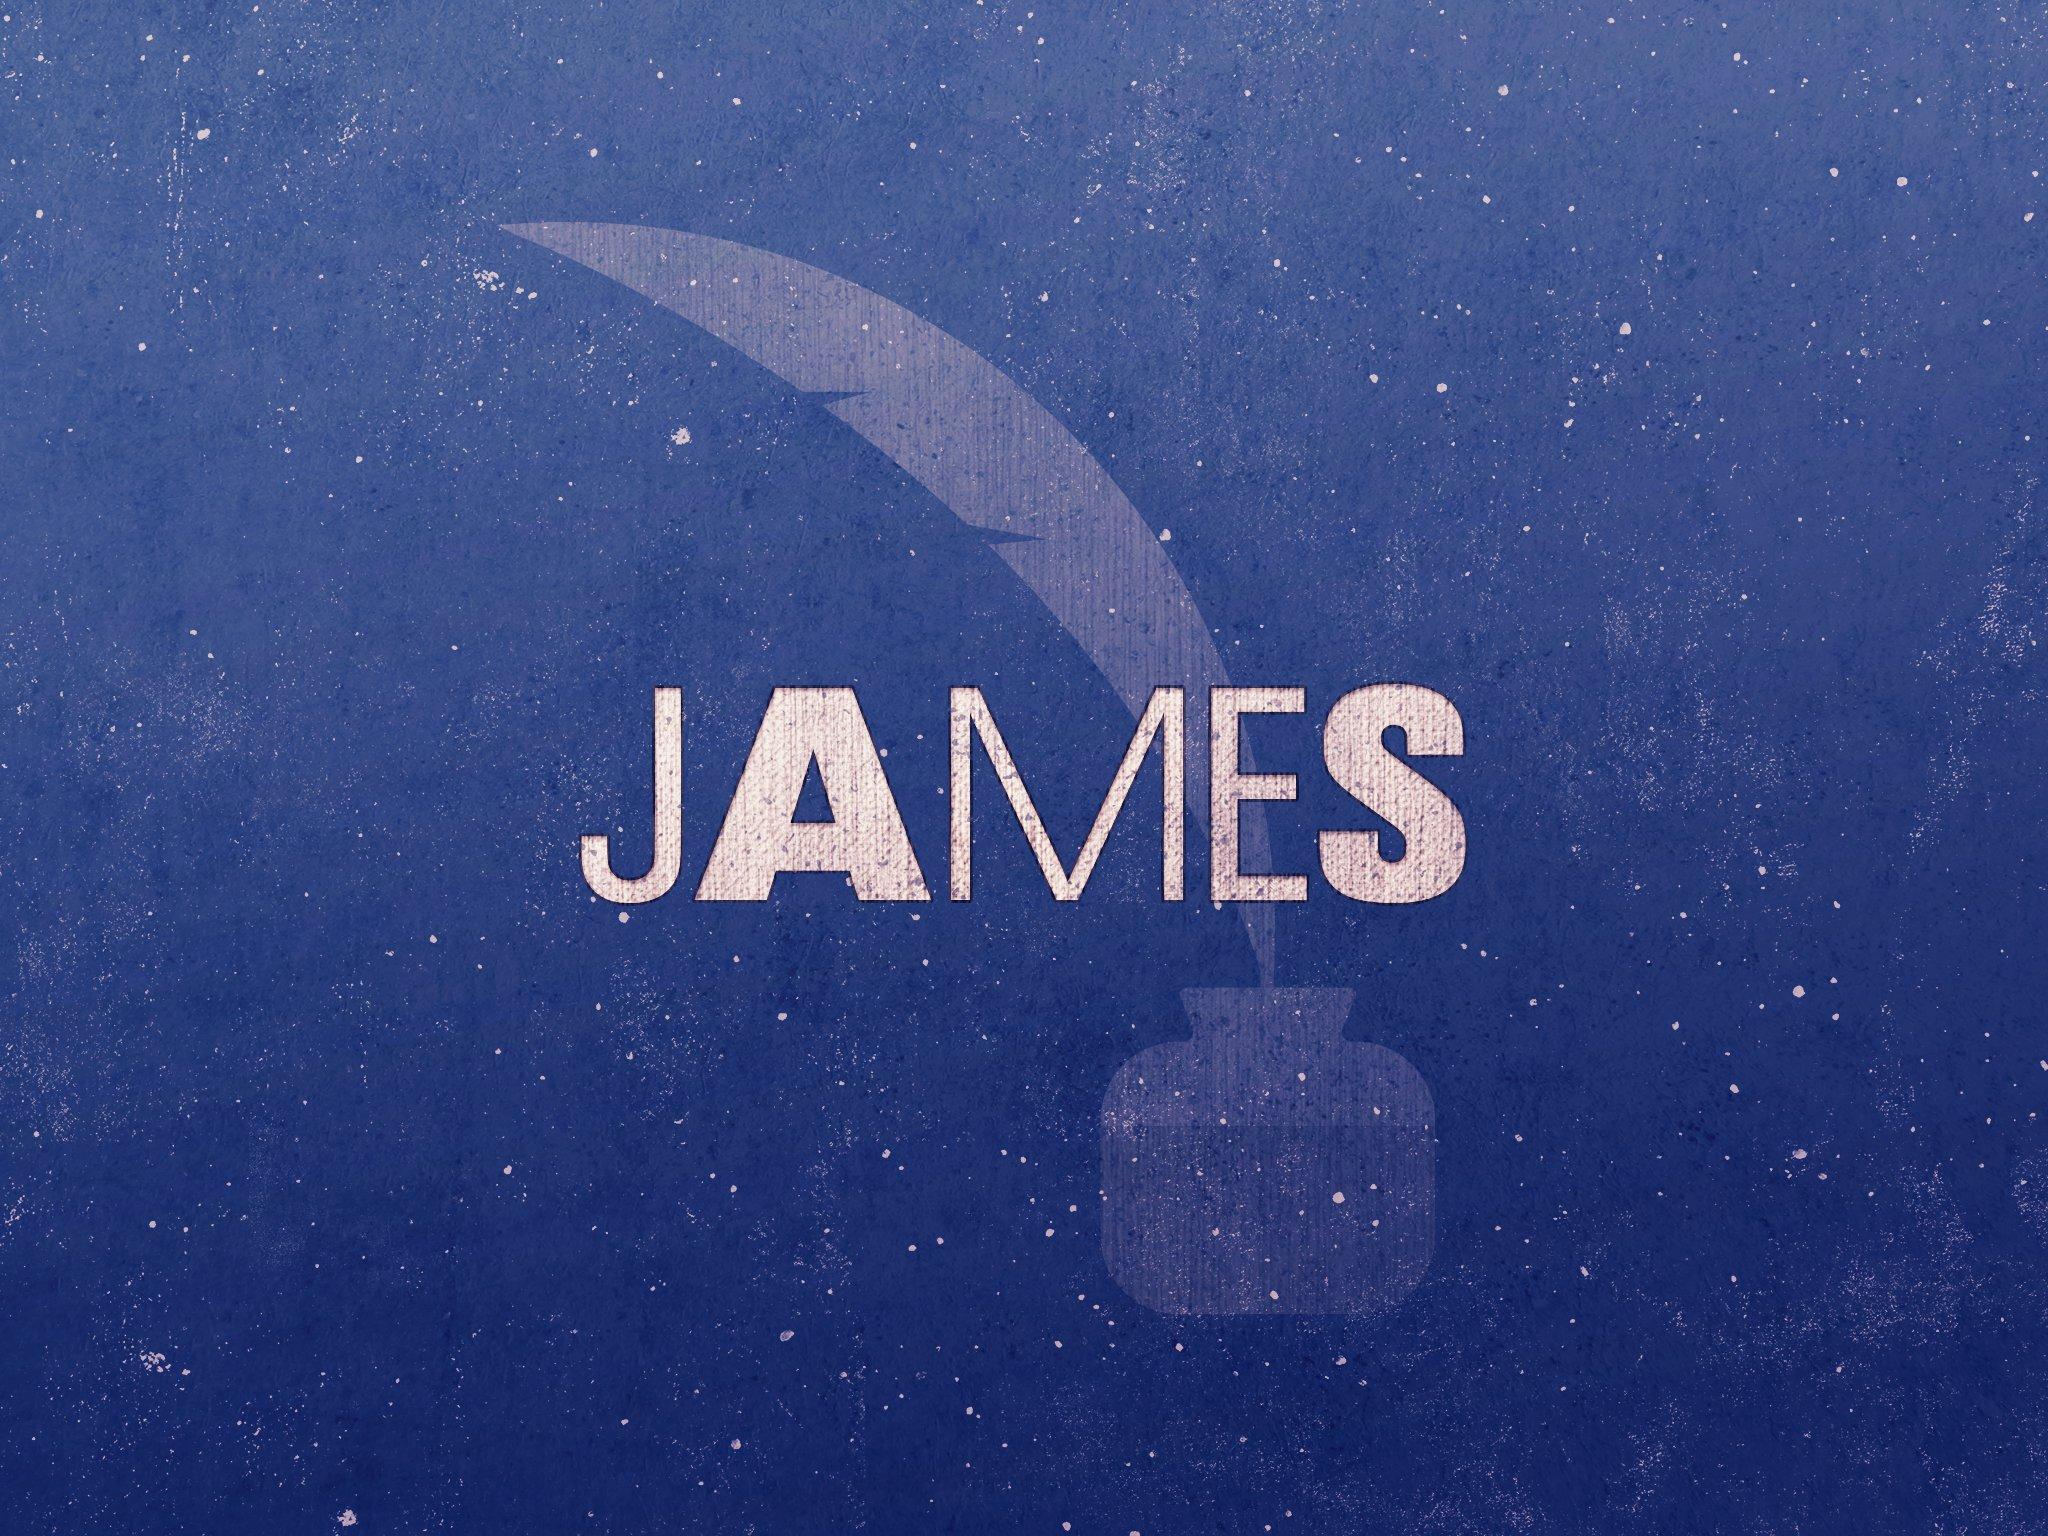 59-James_Title_4x3-fullscreen.jpg